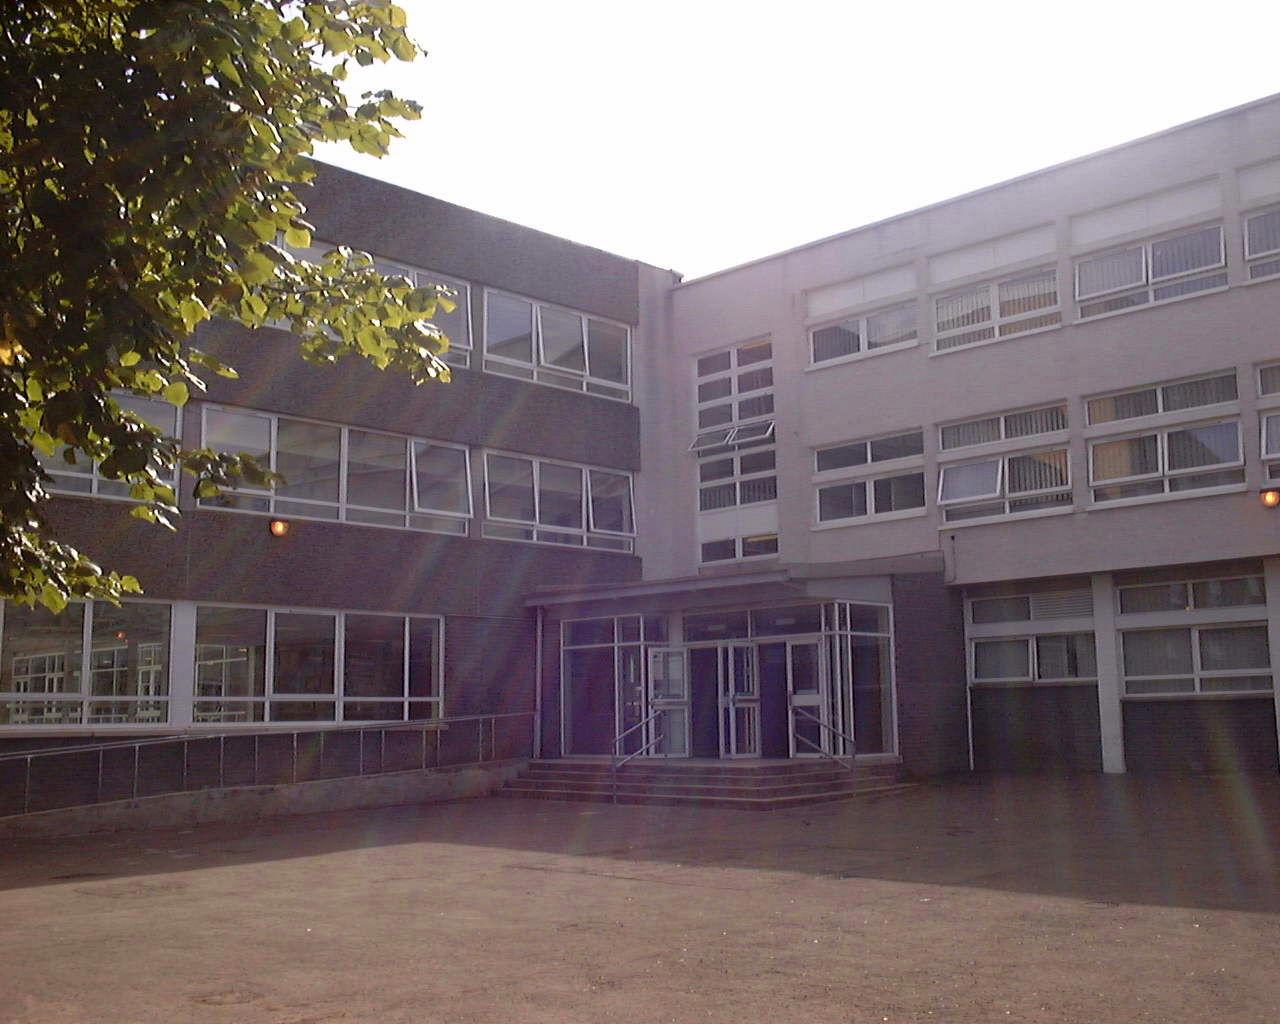 Hillpark Secondary School Hillpark Secondary School